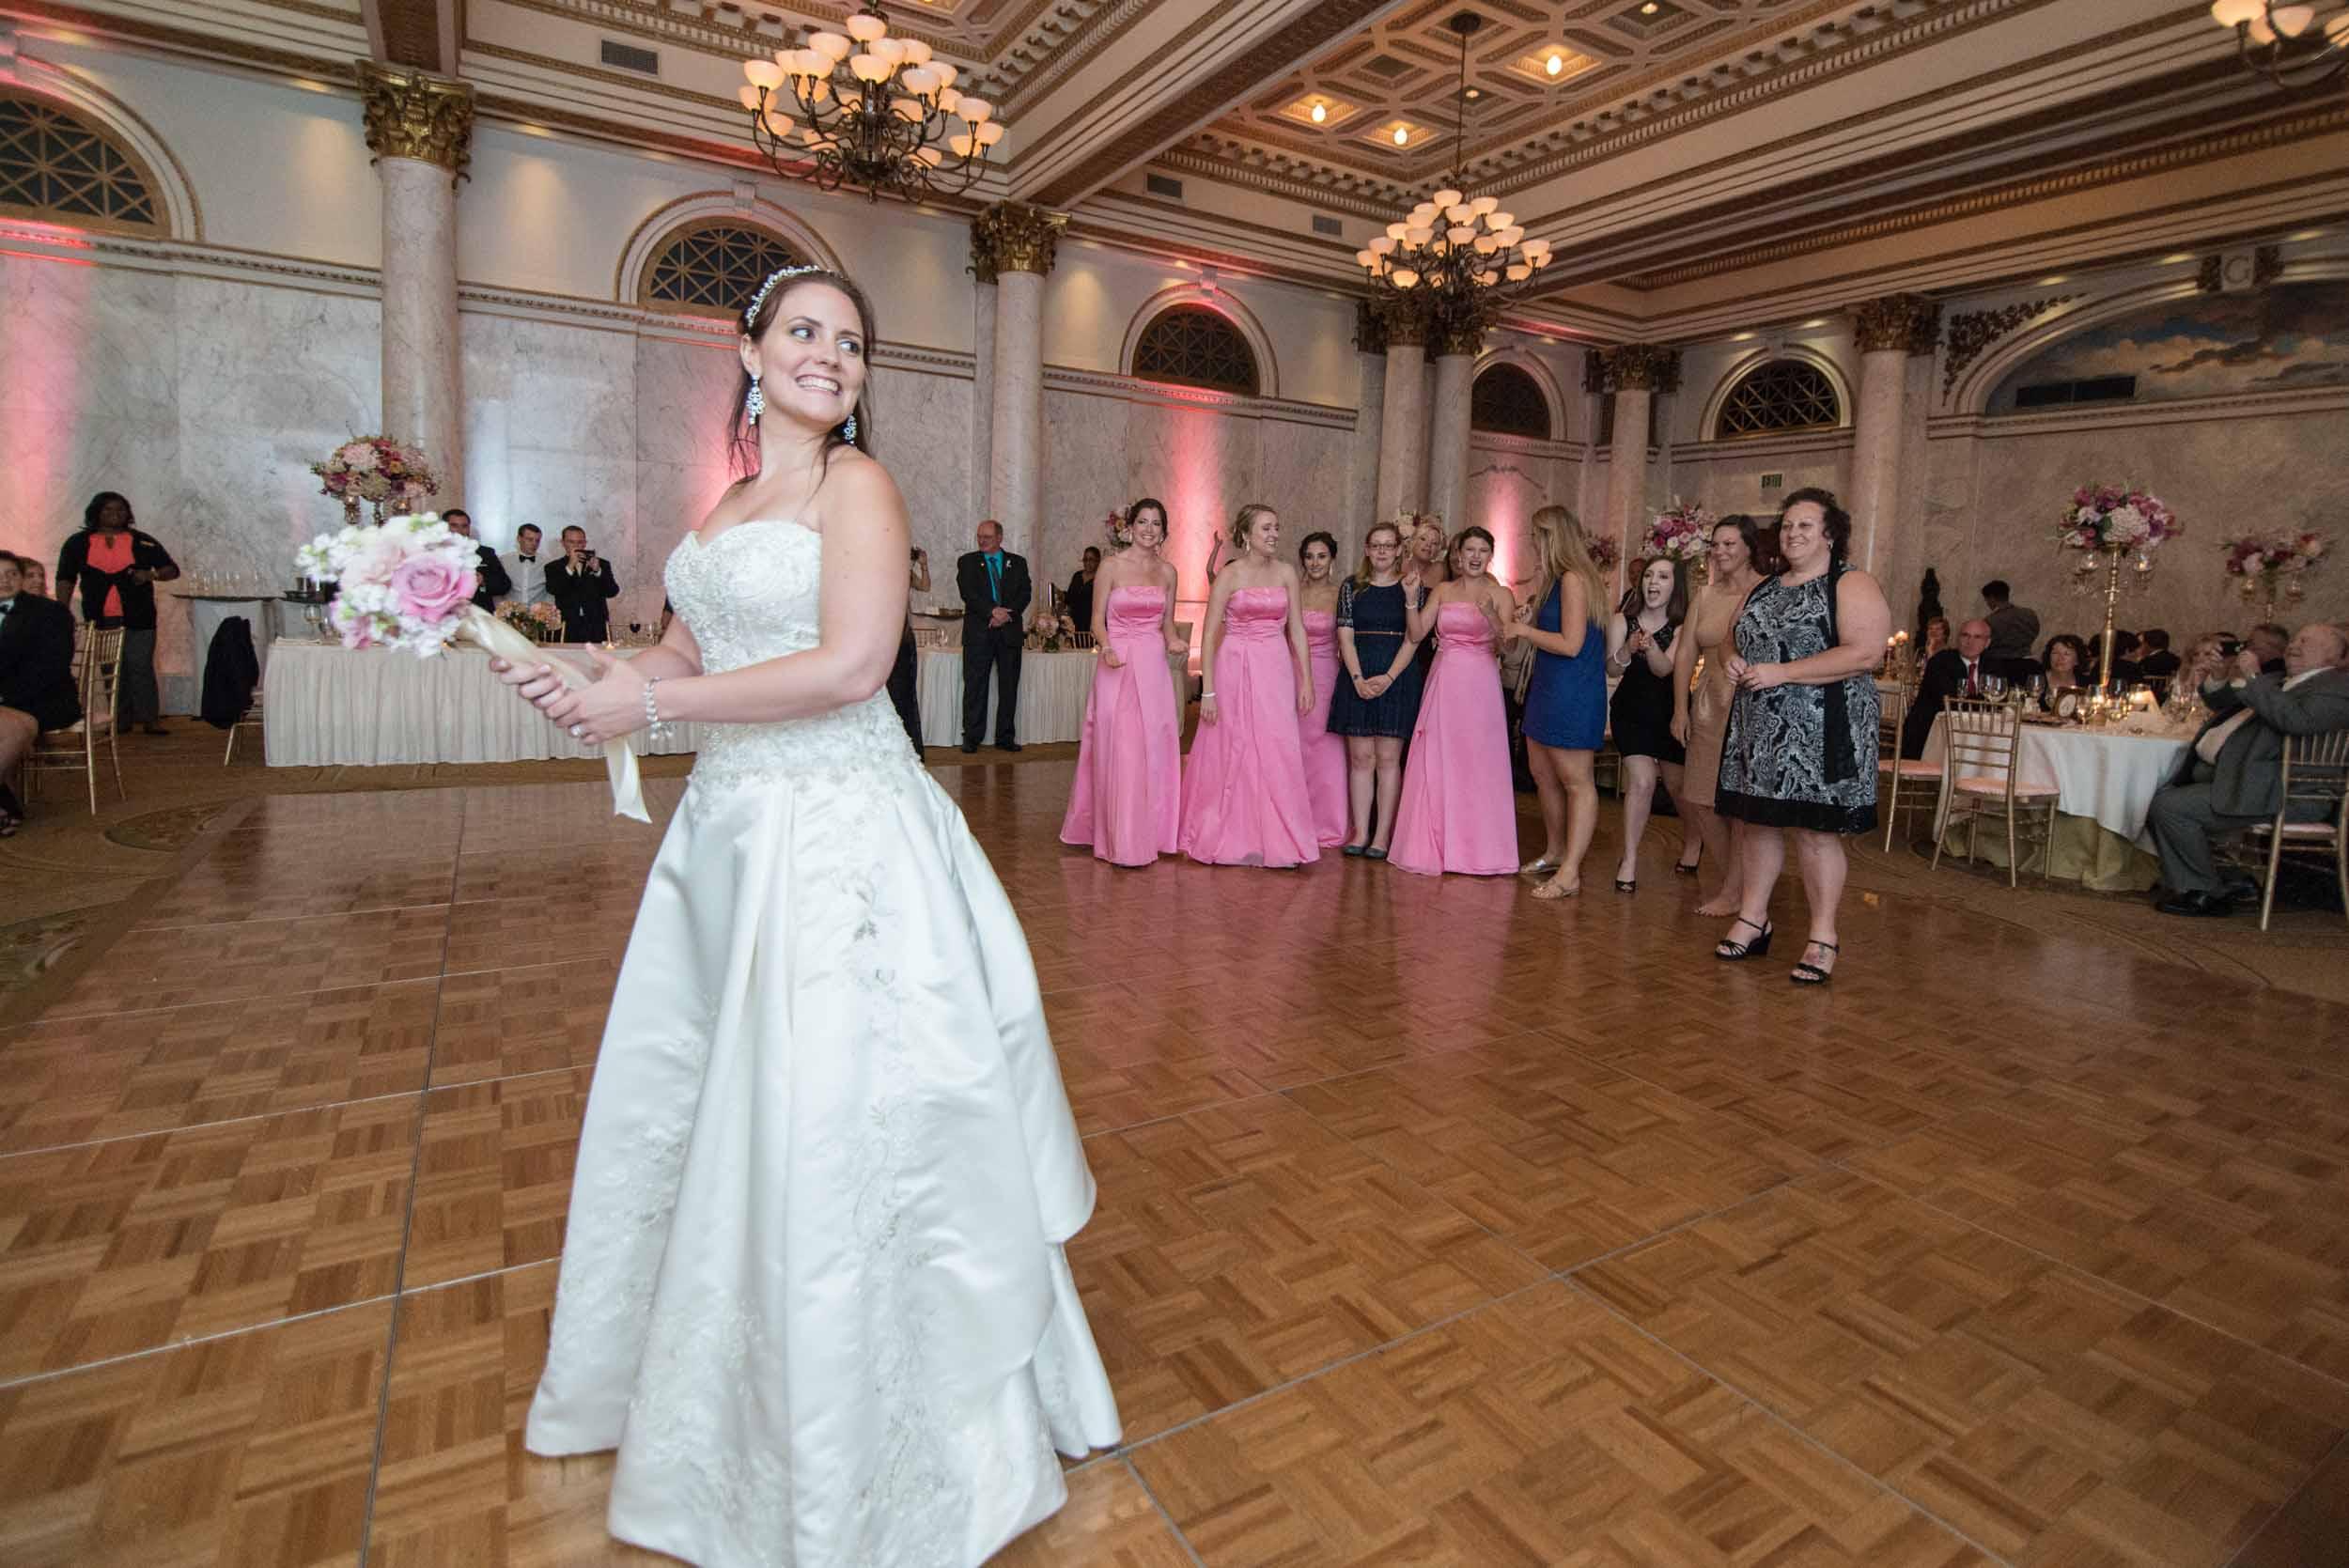 dc+metro+wedding+photographer+vadym+guliuk+photography+wedding+garter+toss-2020.jpg